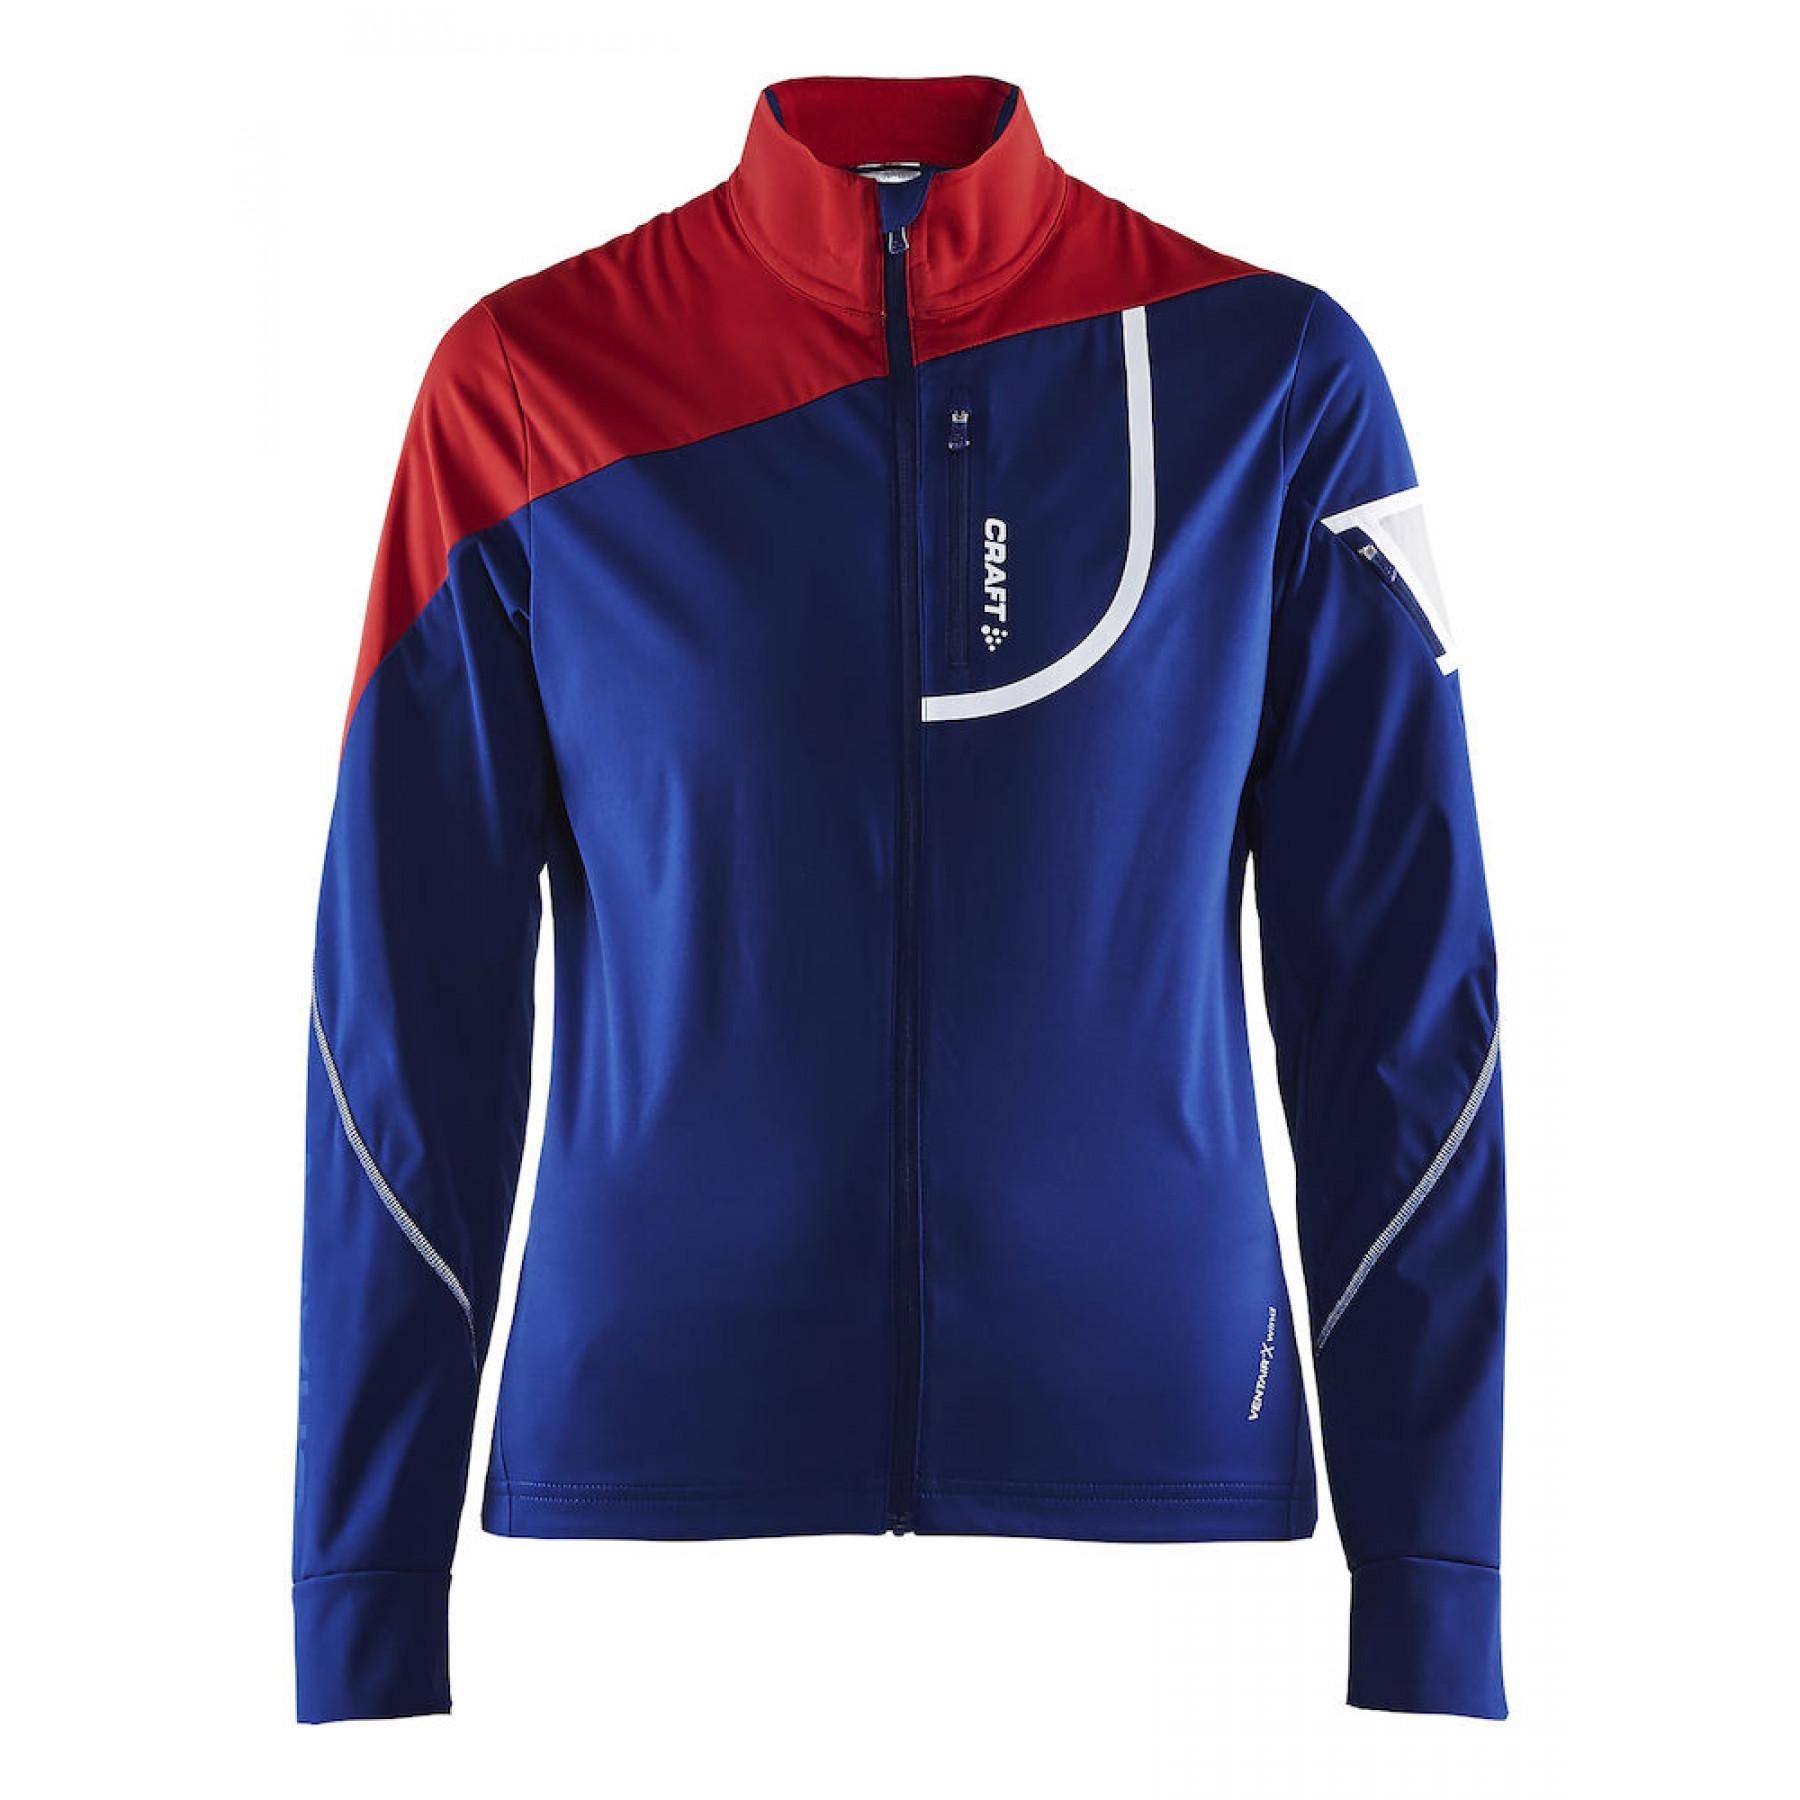 0c3548939 Craft Pace Jacket Women's Thunder/Express